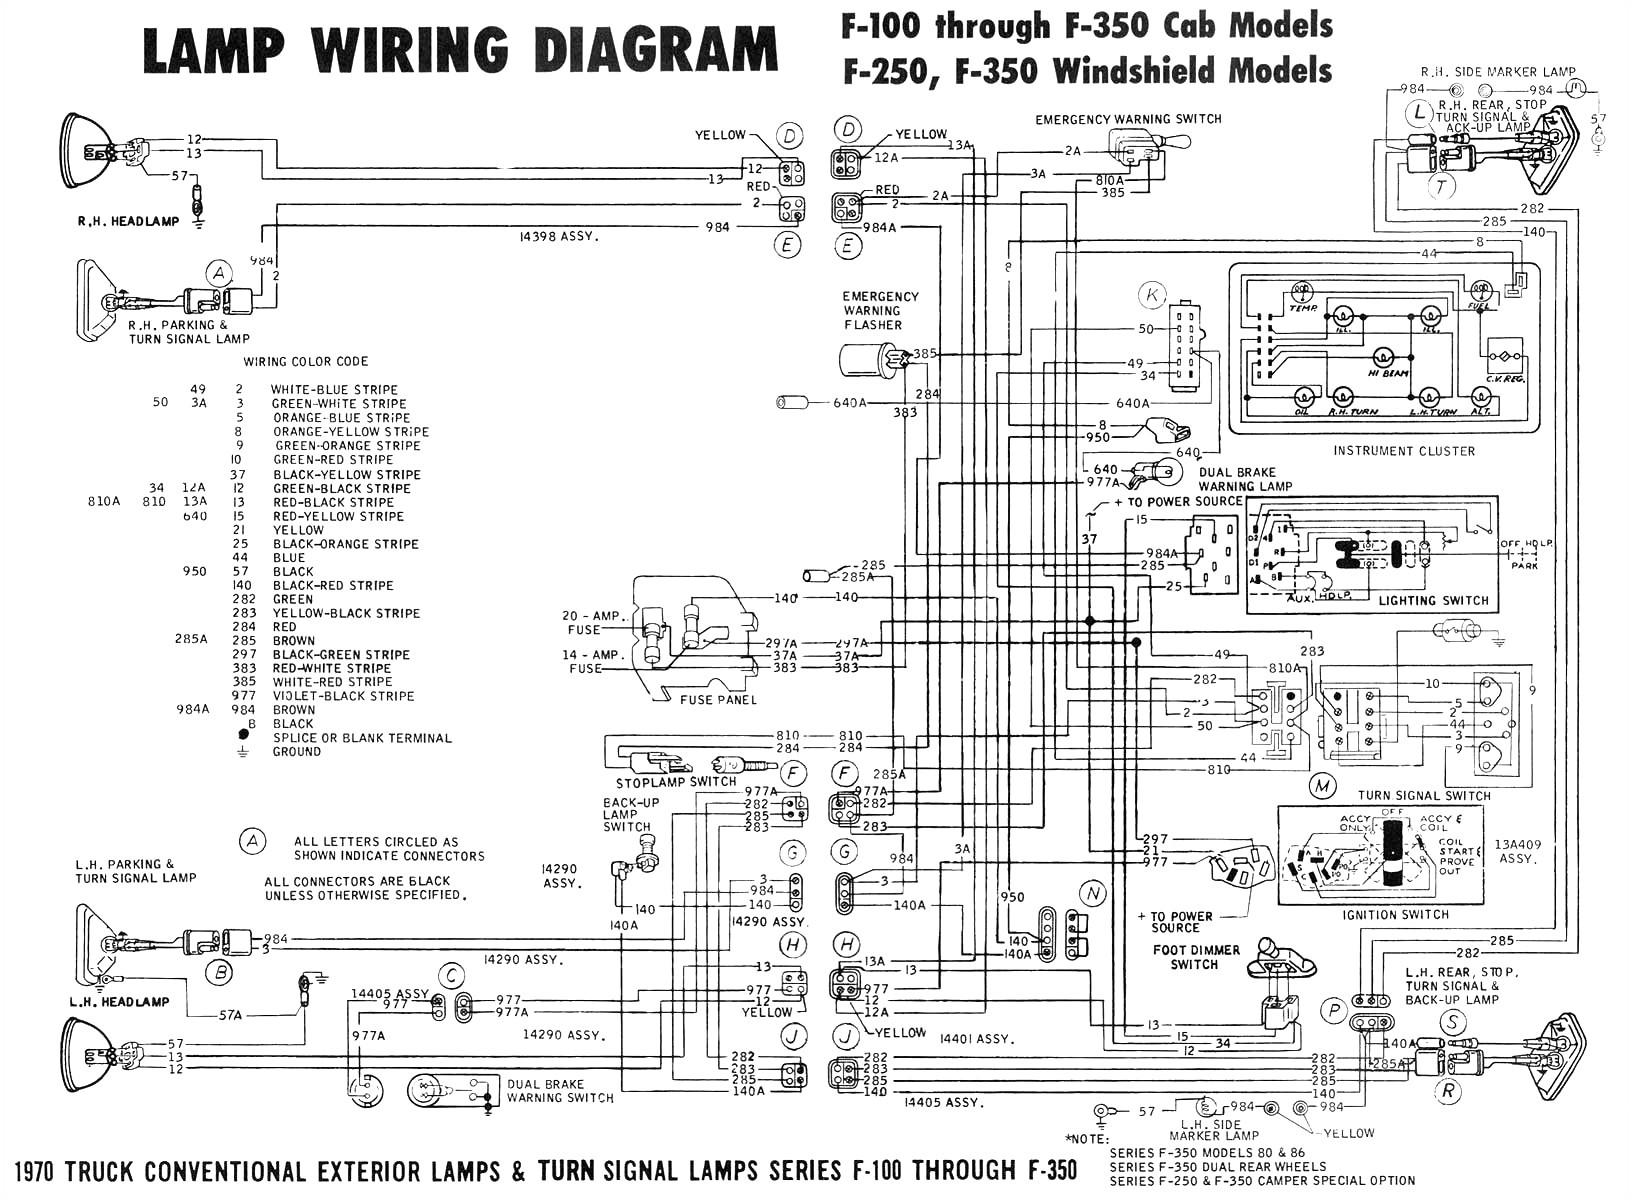 wrangler vacuum lines diagram on harley davidson vacuum lines diagram moreover chevy 350 vacuum lines diagram